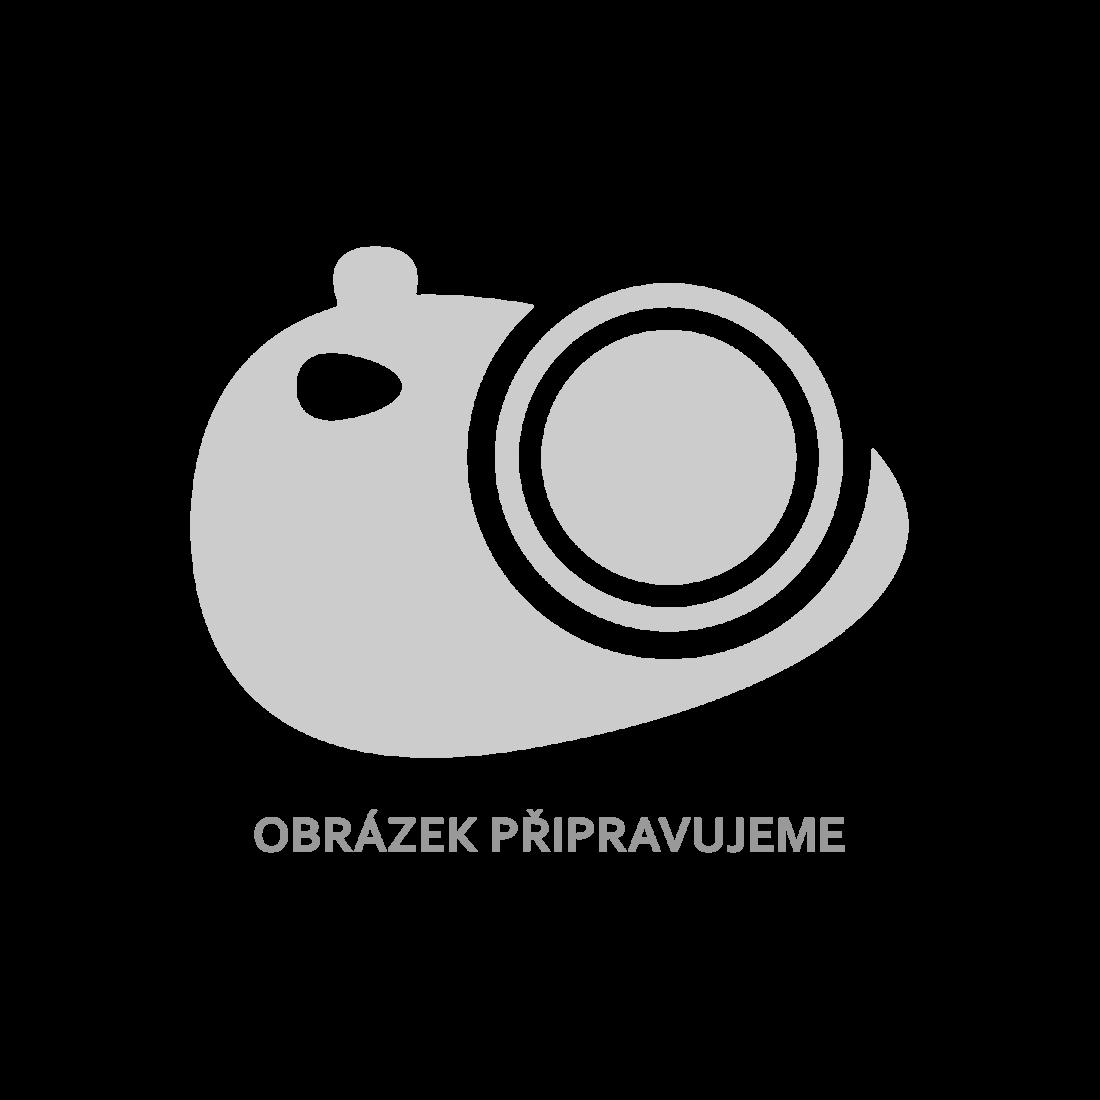 vidaXL Zahradní stůl hnědý 75 x 40 x 37 cm polyratan [45903]